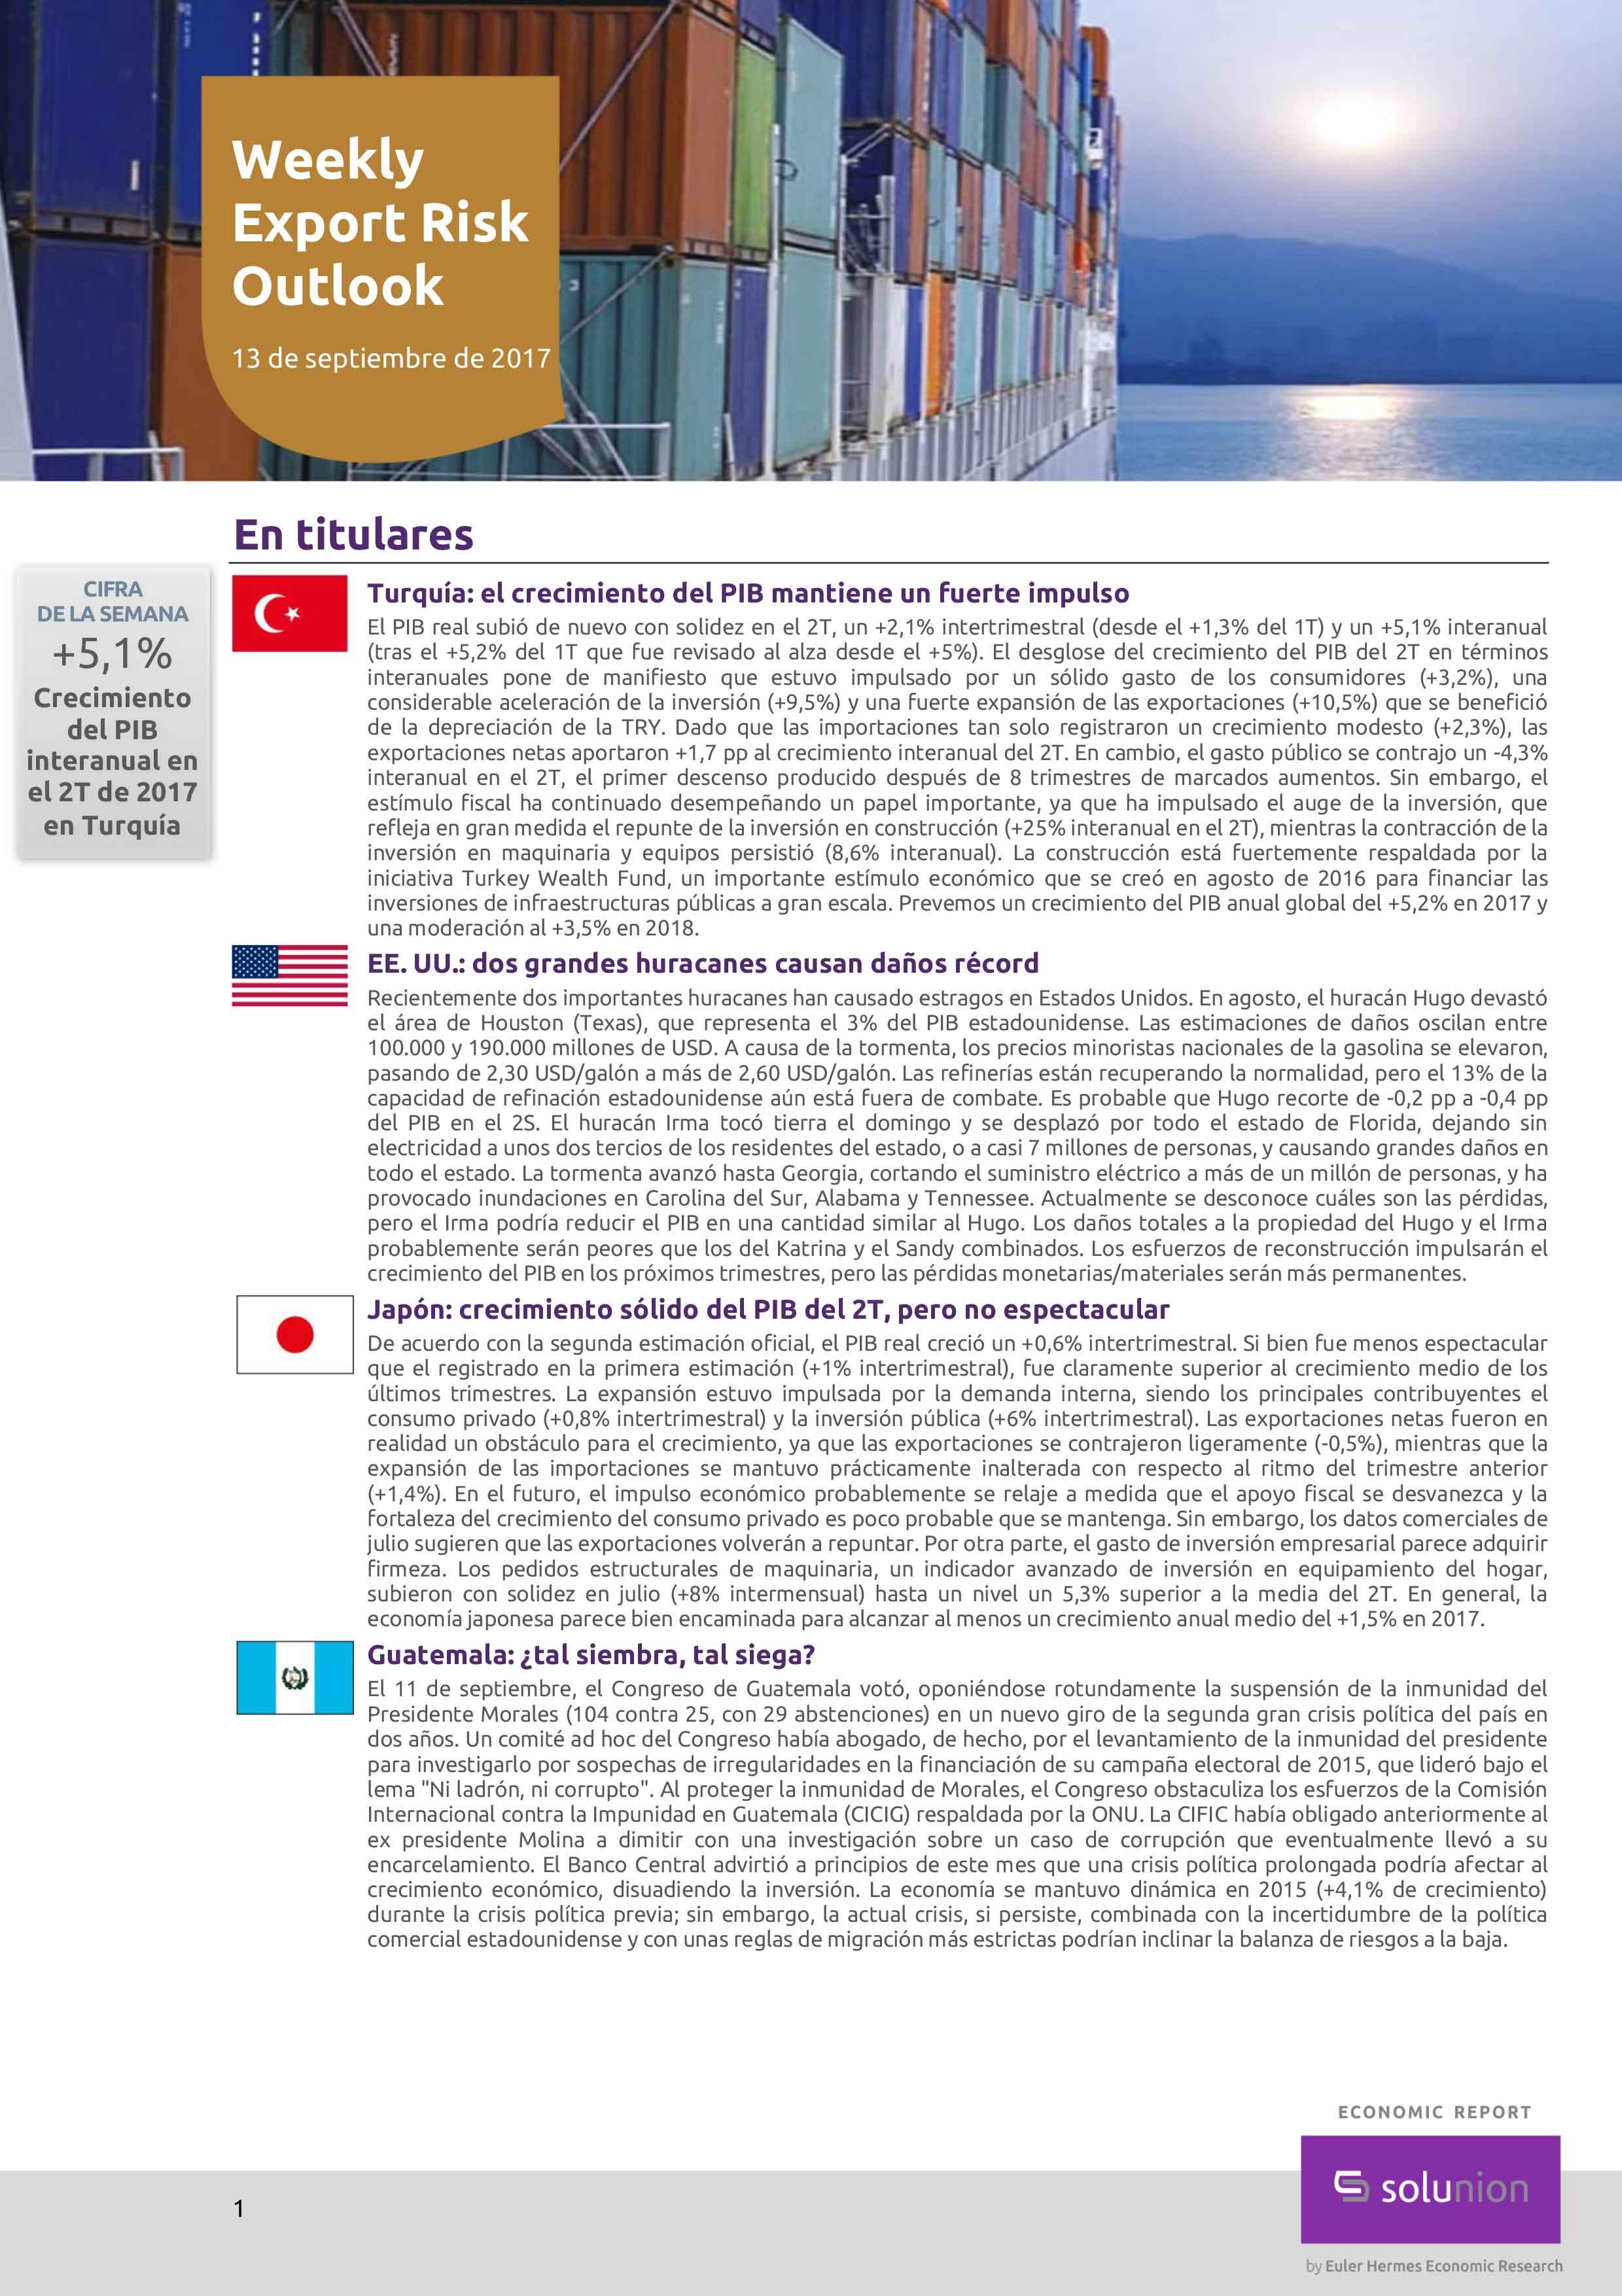 Weekly Export Risk Outlook – 13 de septiembre de 2017